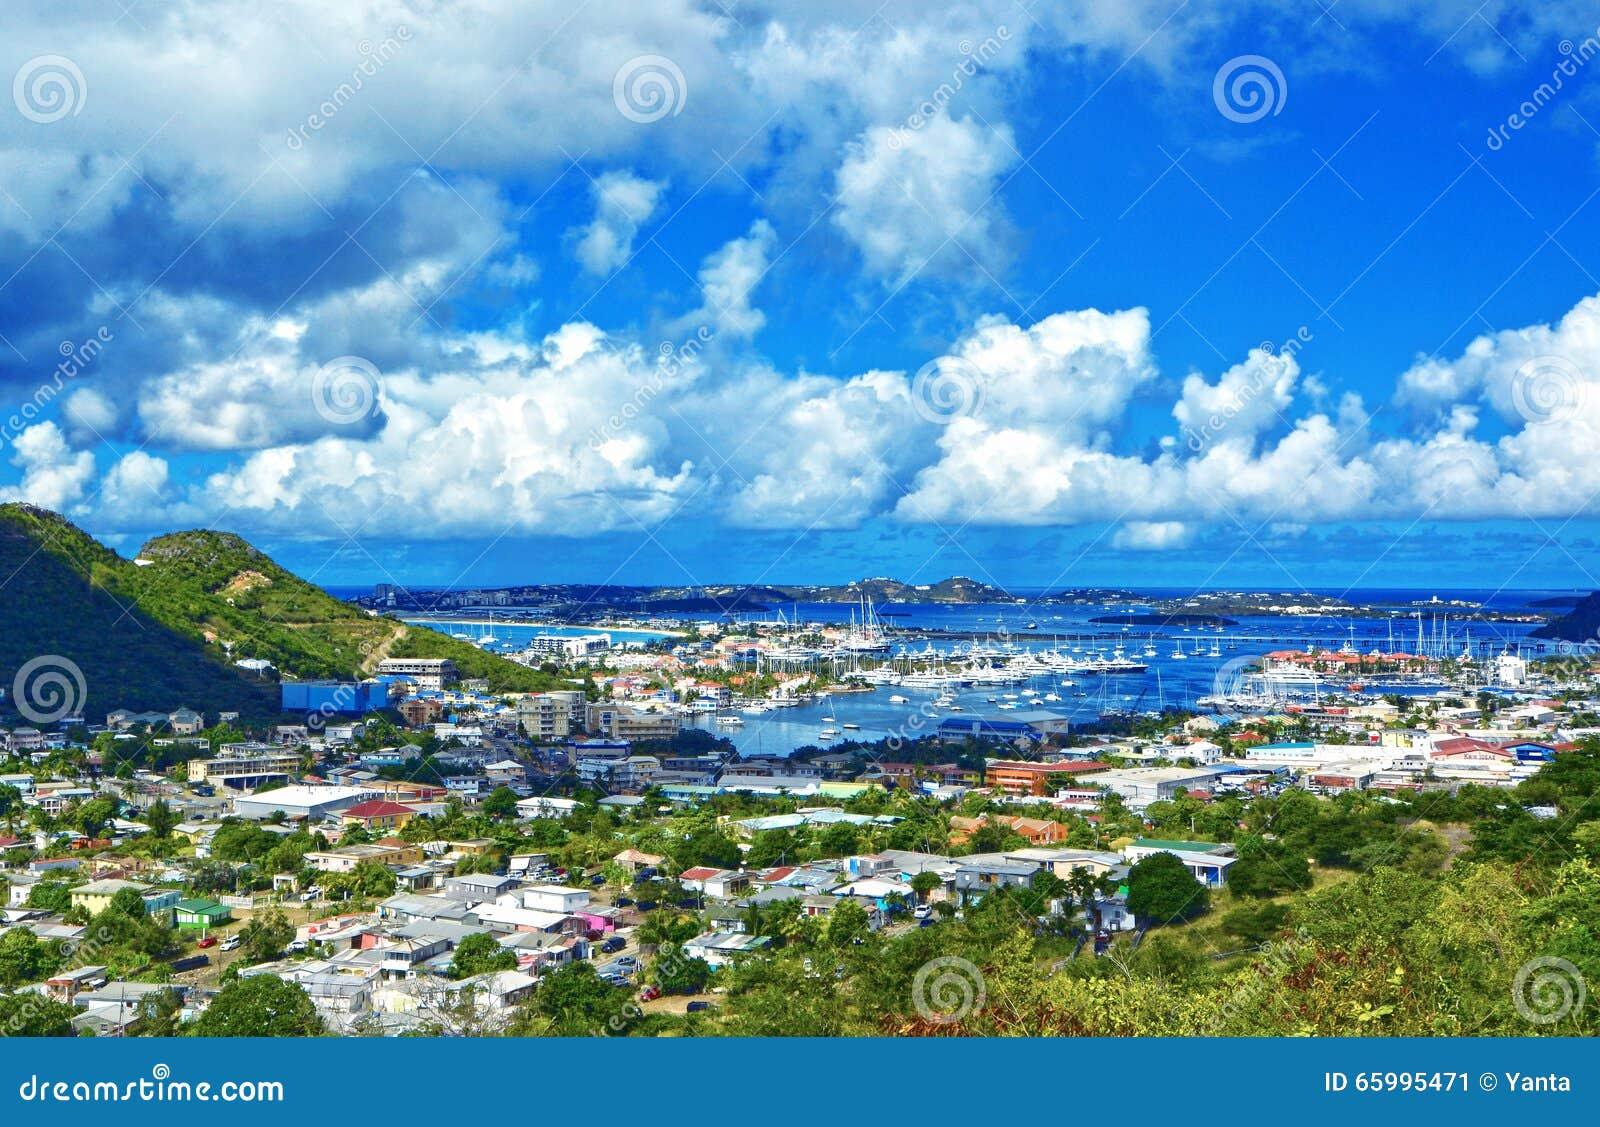 Isola di st martin mar dei caraibi immagine stock for Isola di saint honore caraibi